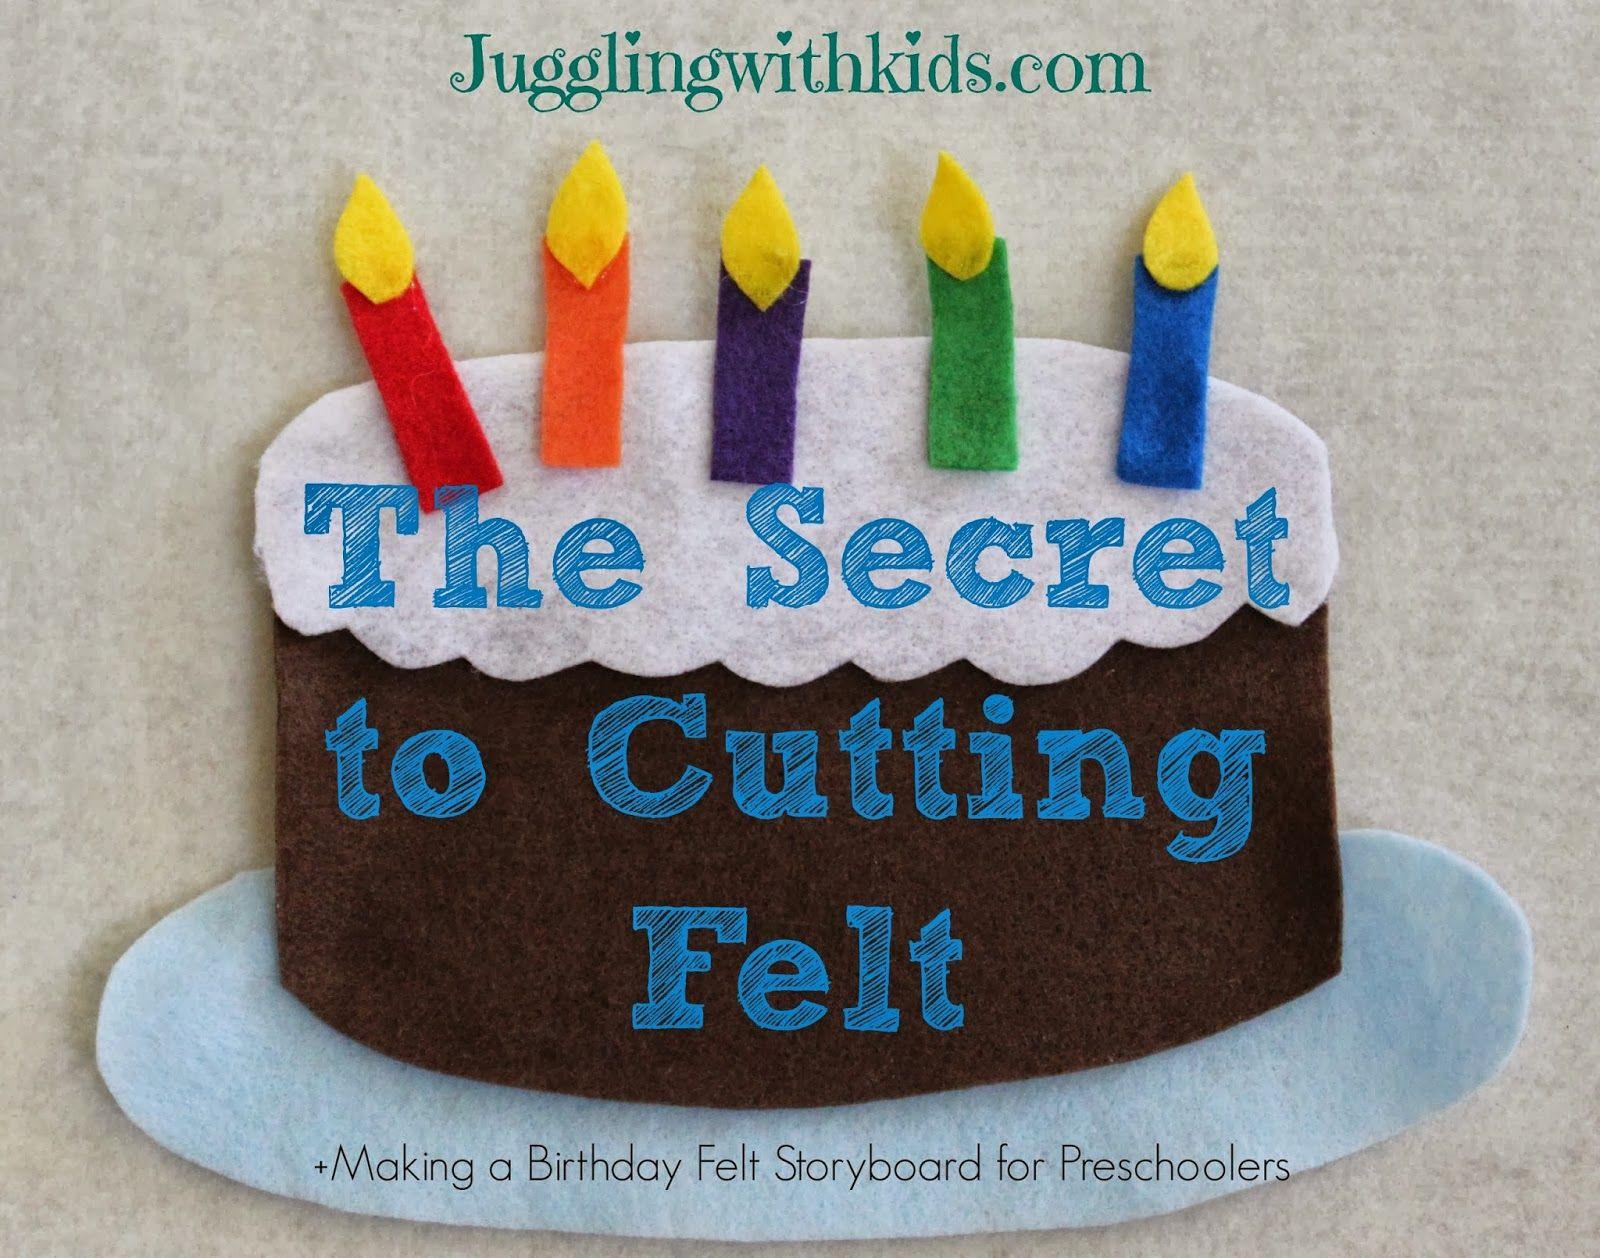 Juggling With Kids The Secret To Cutting Felt Amp Making Felt Storyboards For Preschoolers